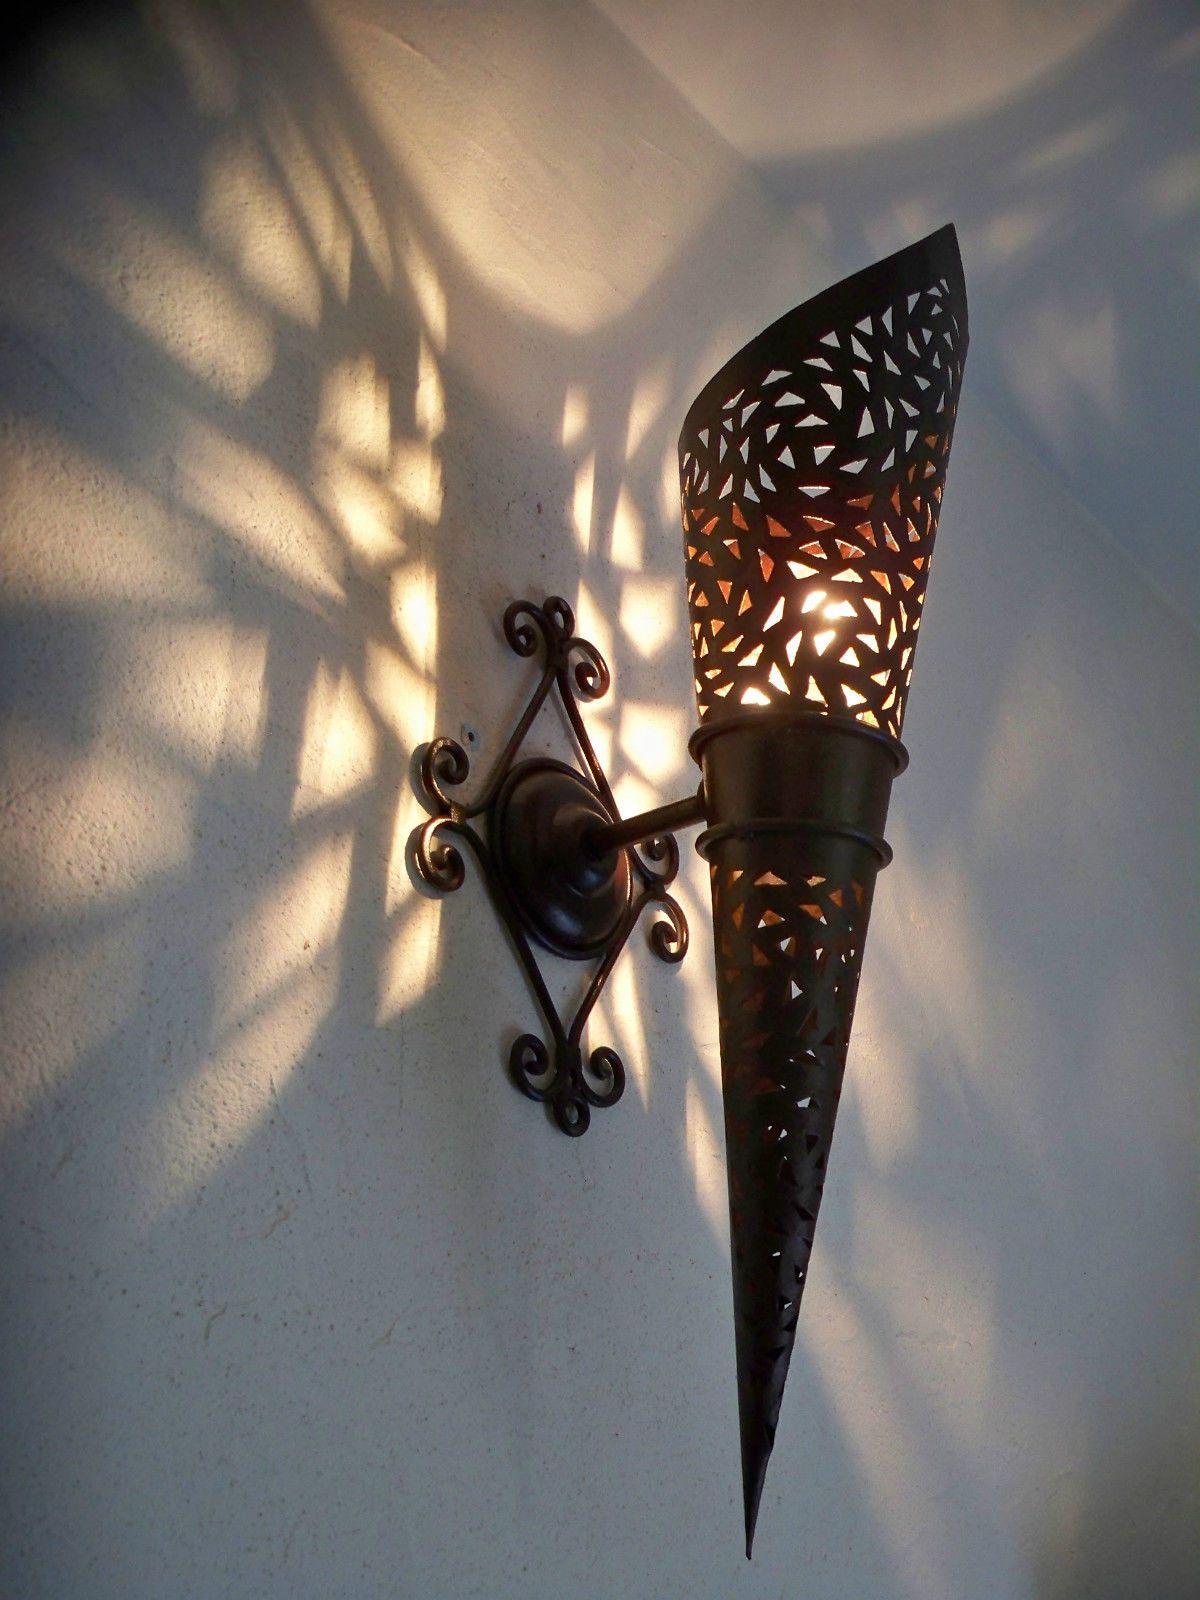 58 Cm Wall Torch Moroccan Wrought Iron Lamp Lantern Eastern Luster Fakkels Lampen Wanden